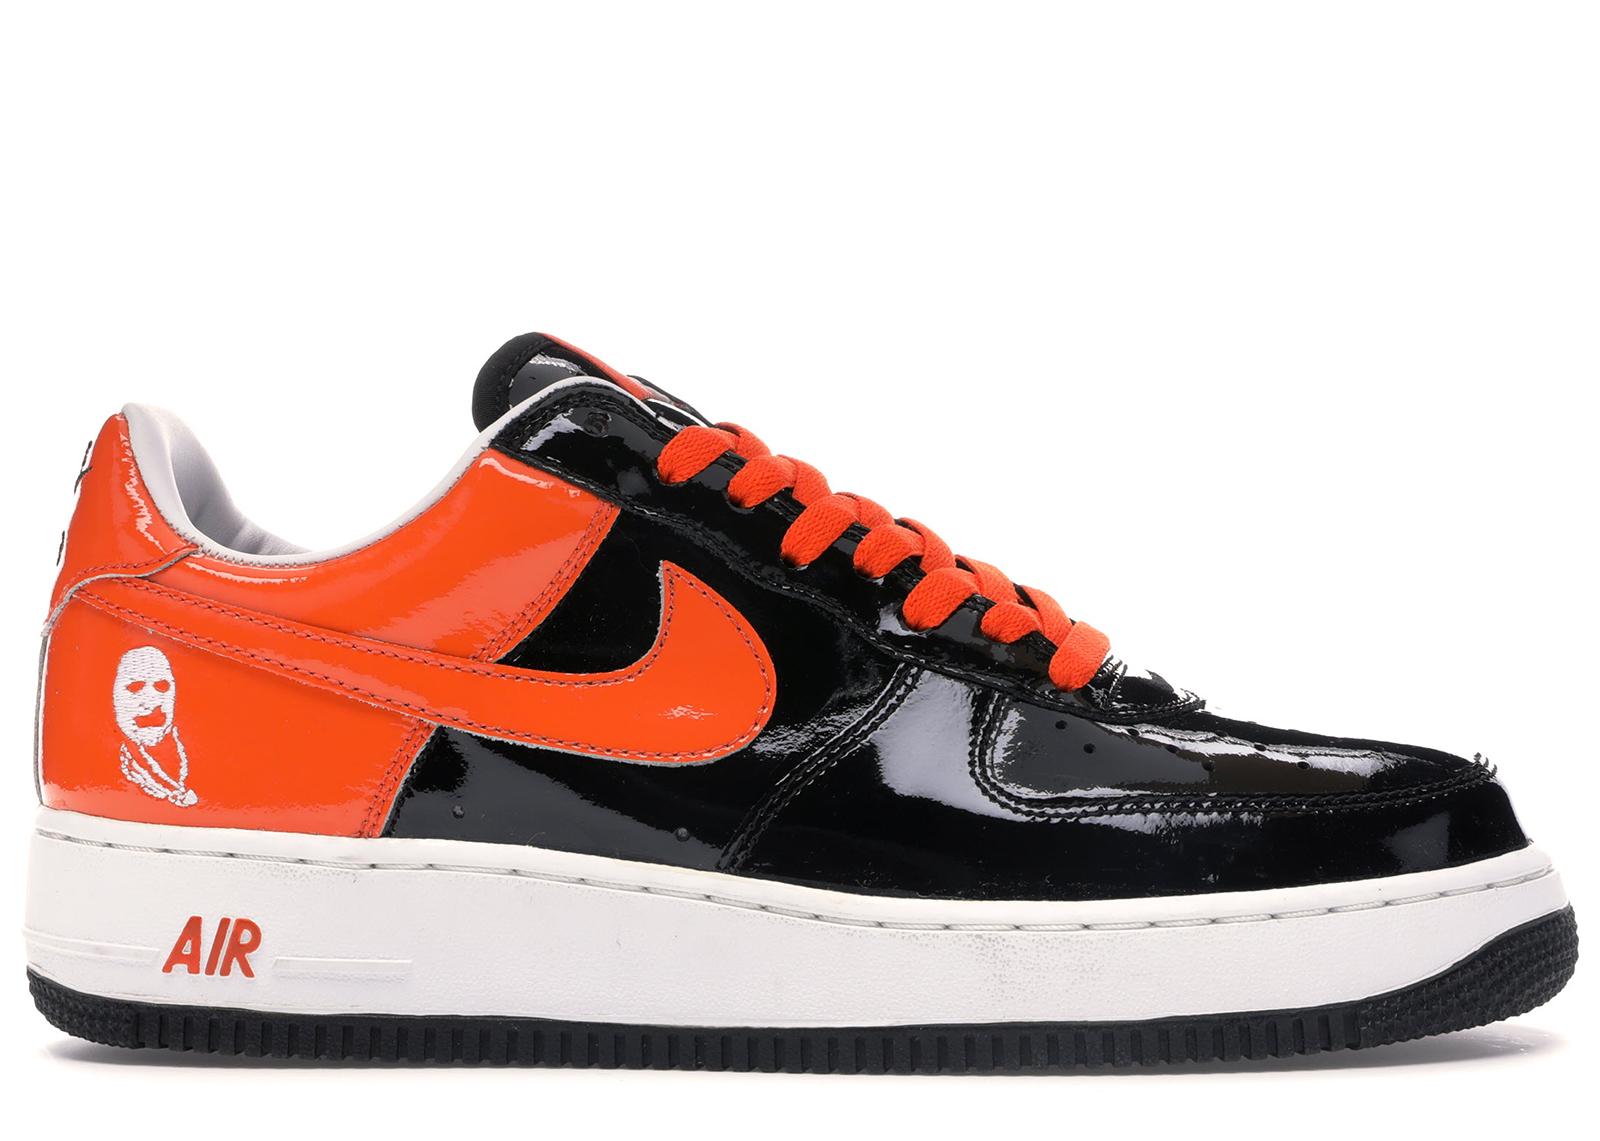 Nike Air Force 1 Low Halloween (2005